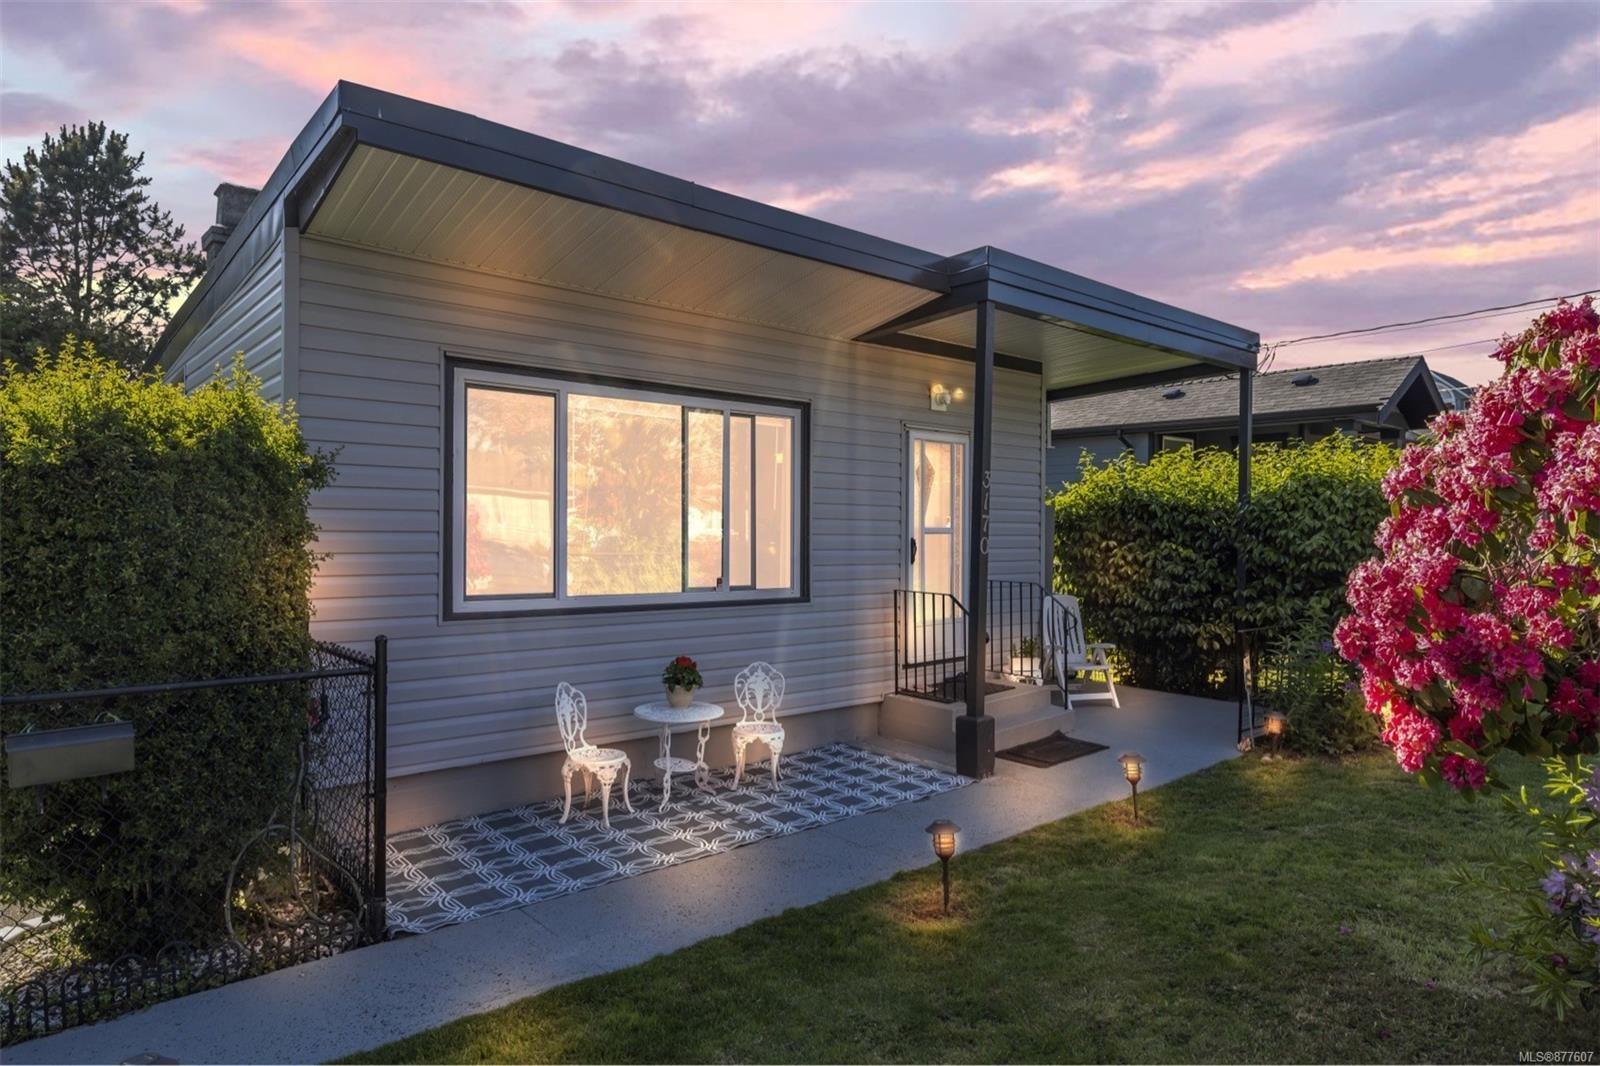 Main Photo: 3170 Alder St in Victoria: Vi Mayfair House for sale : MLS®# 877607